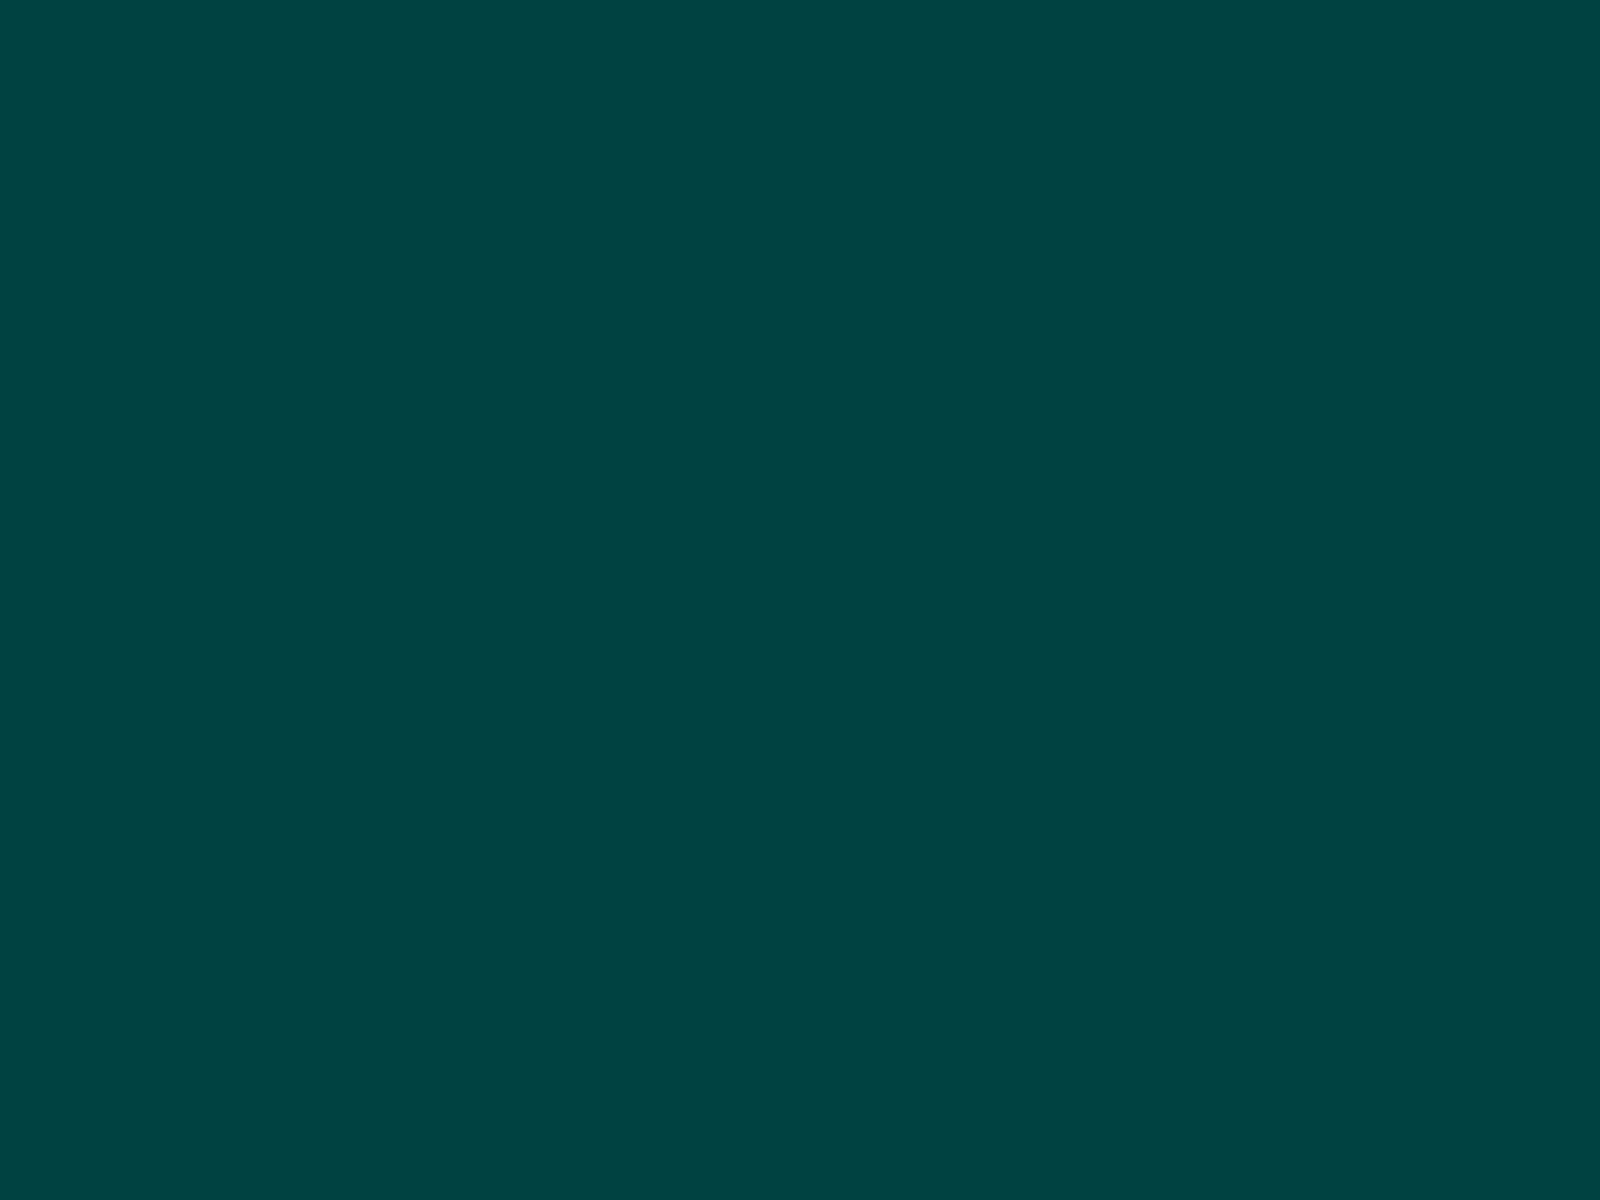 1600x1200 Warm Black Solid Color Background